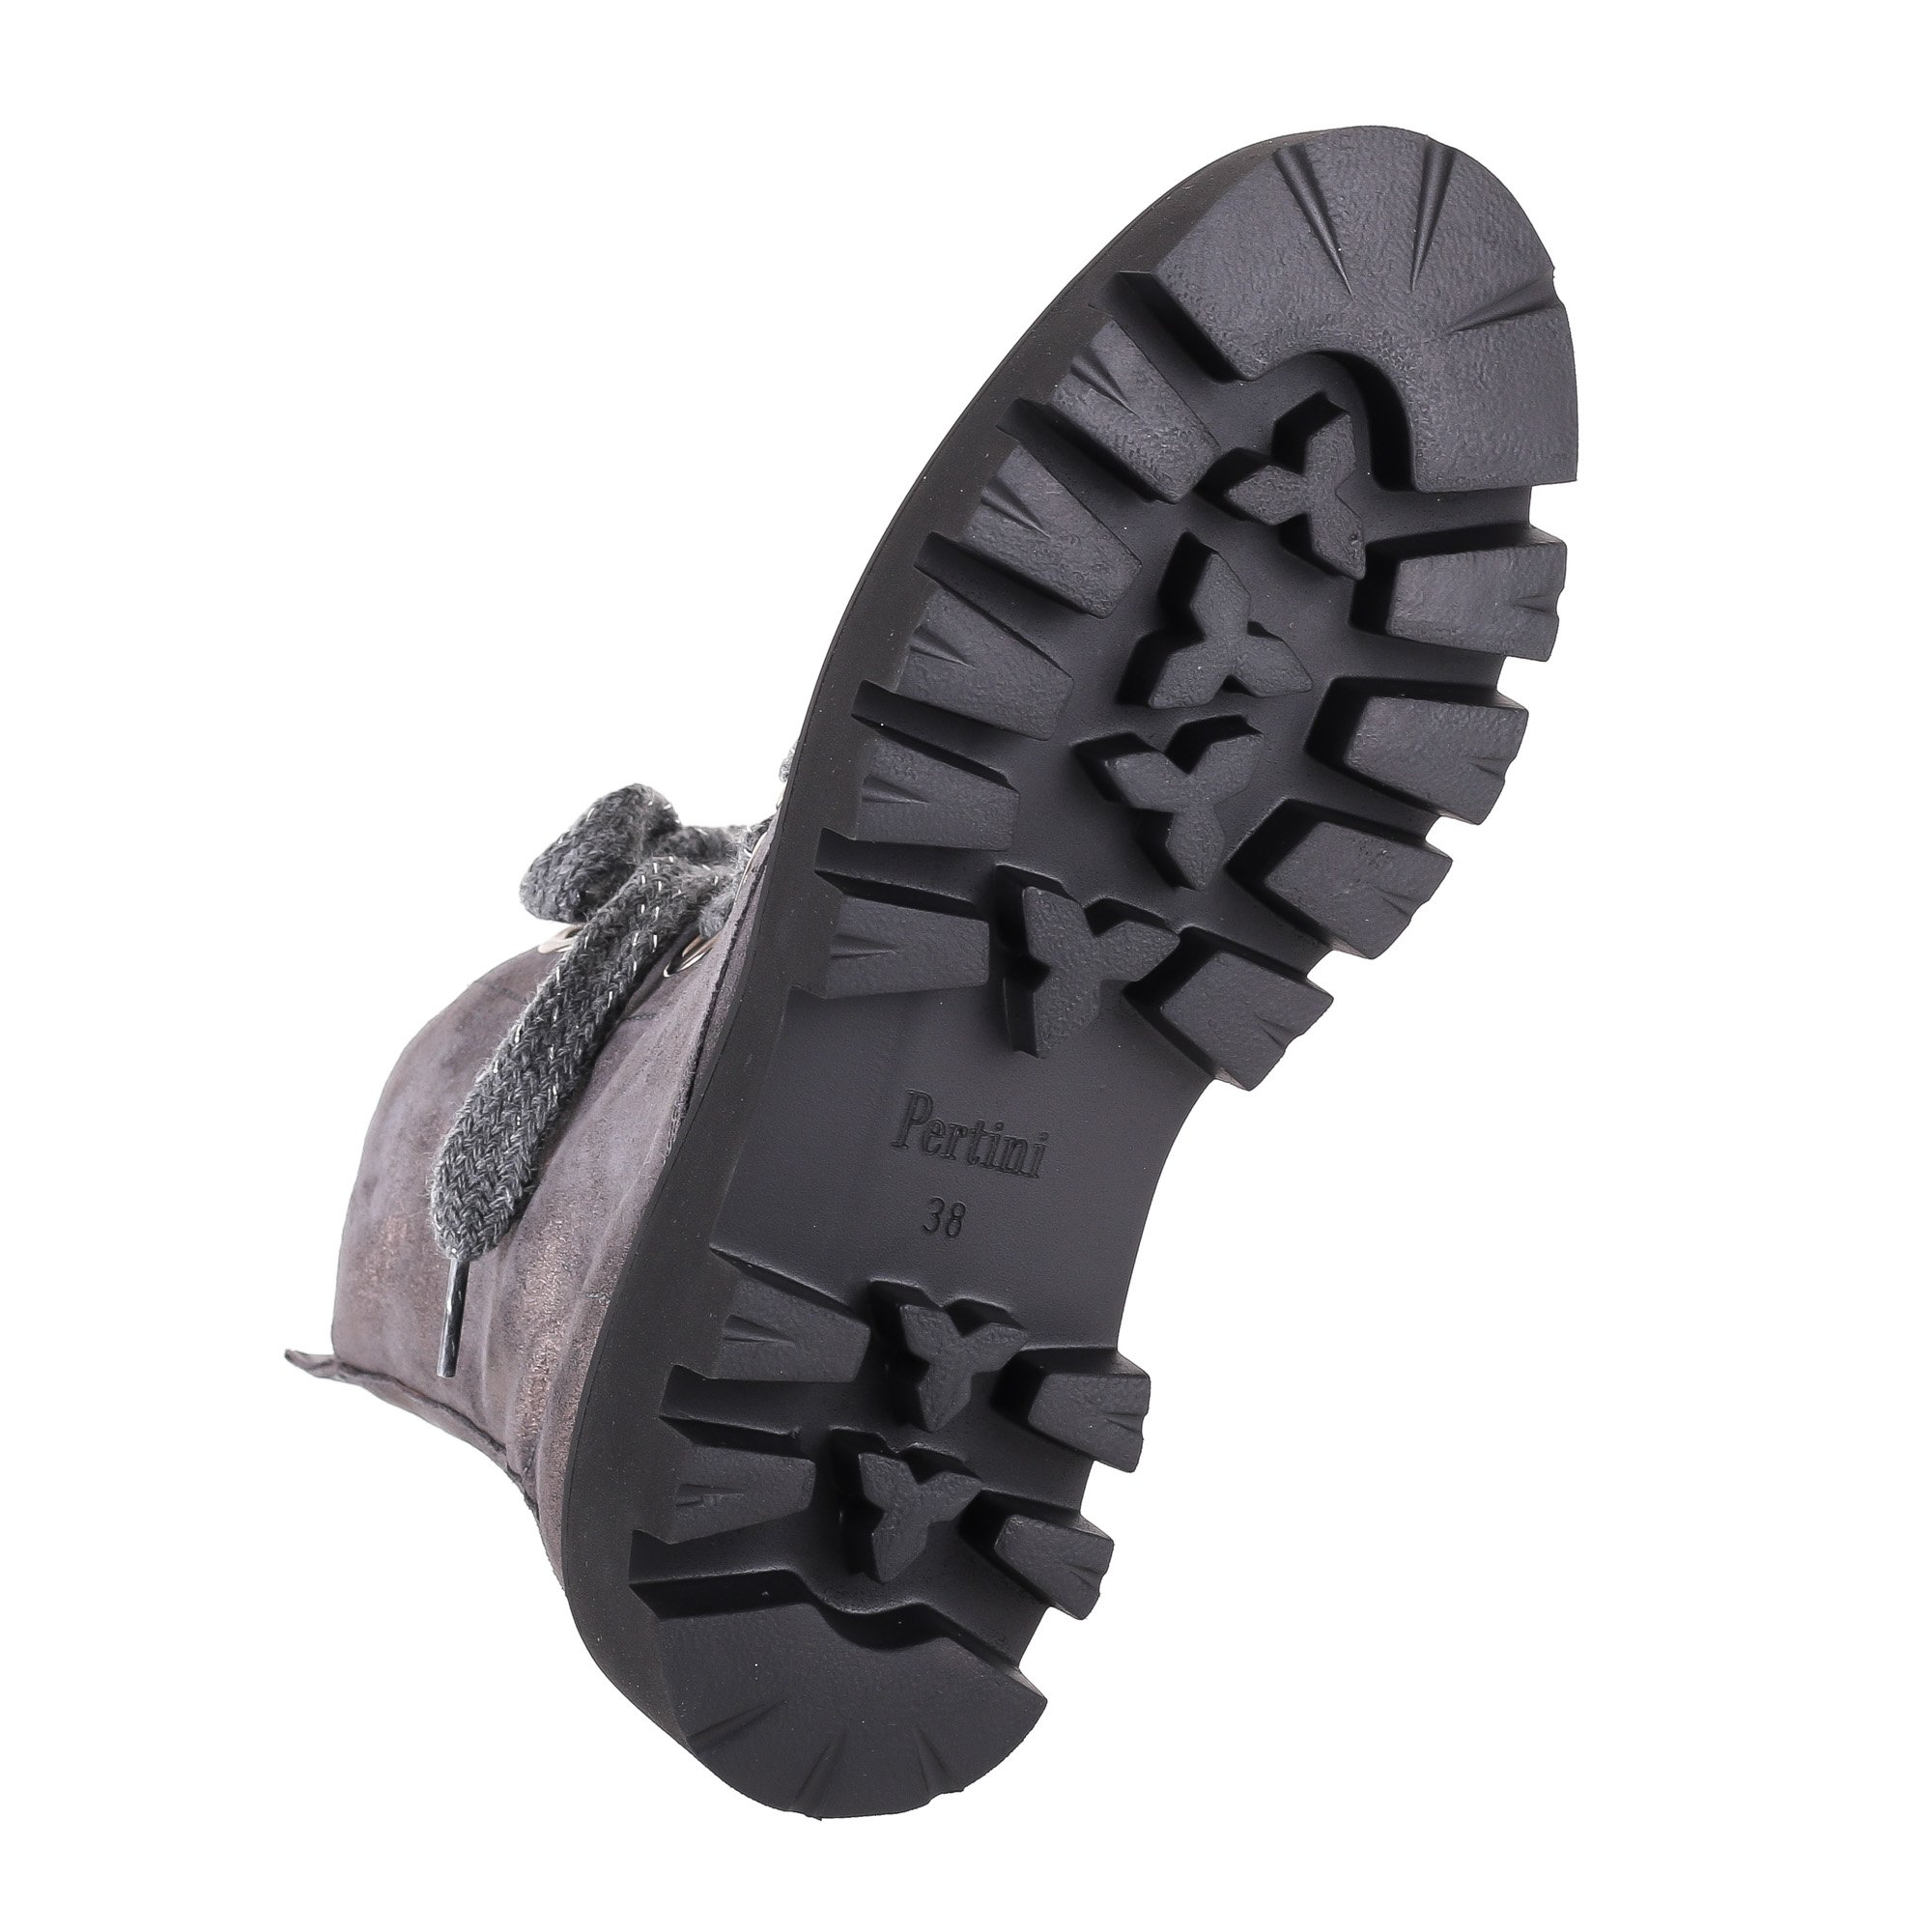 Ботинки Pertini T1660